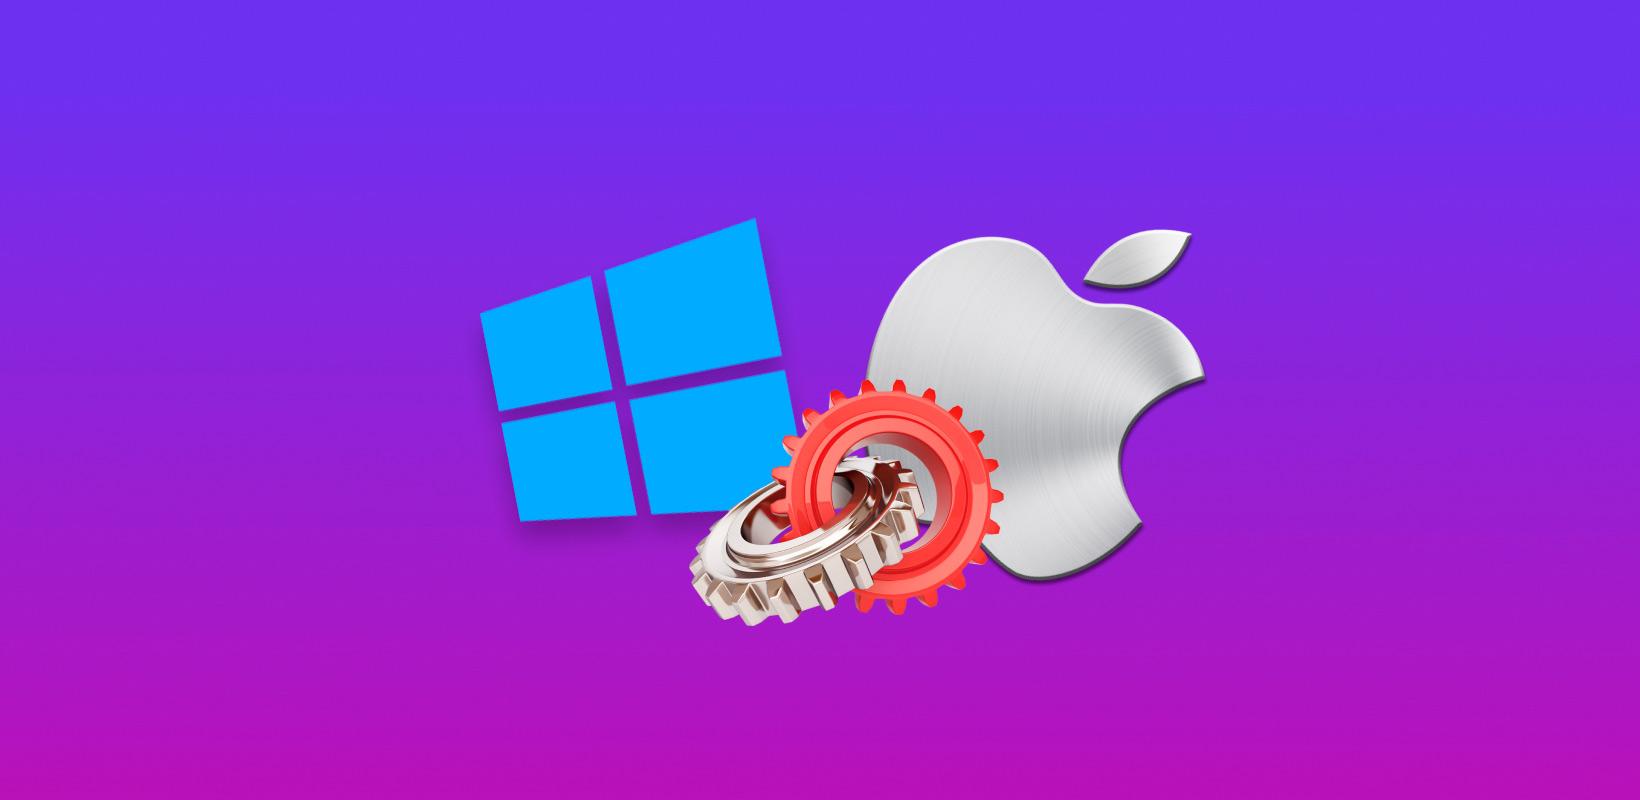 Mac Vs. Pc for Music Production: Customization